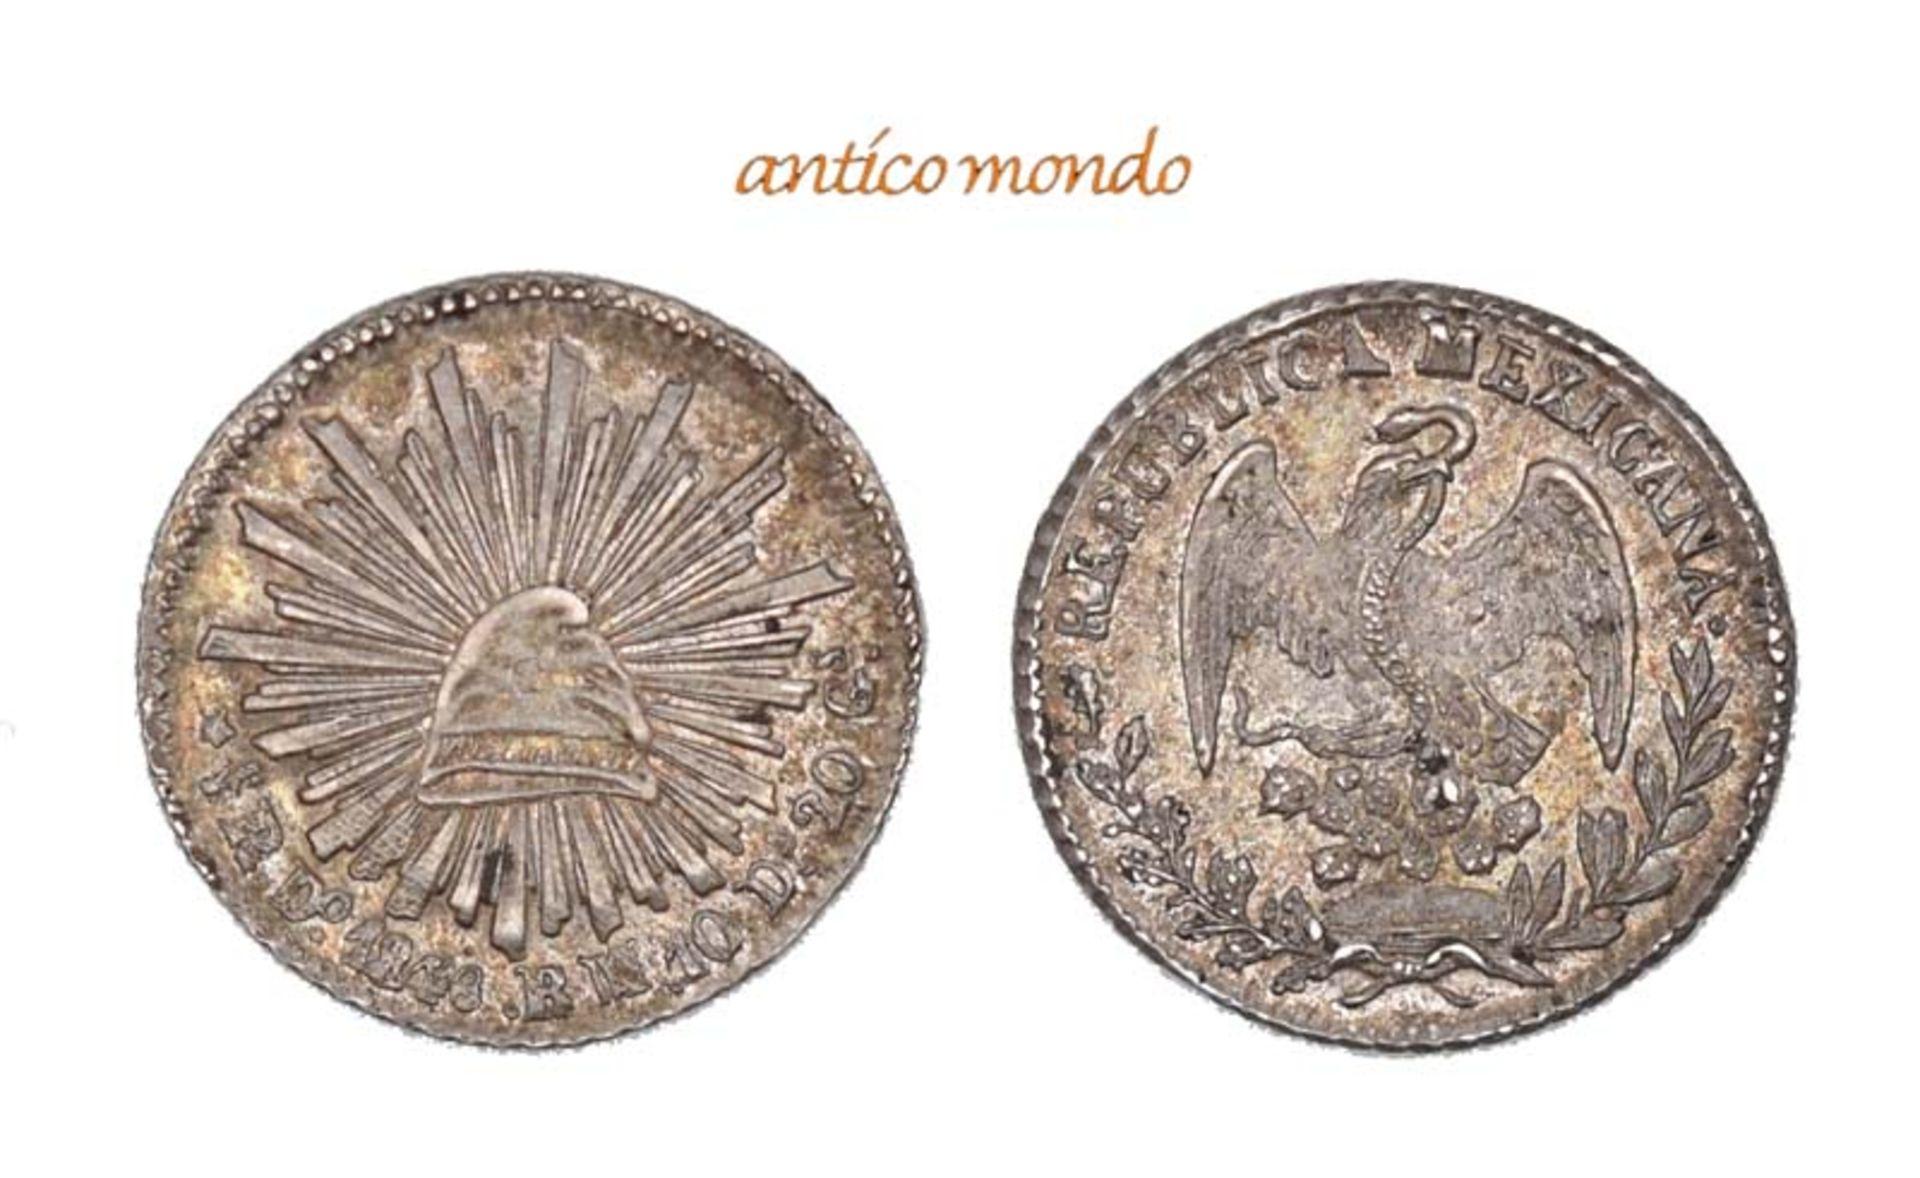 Mexiko, Republik, 1/2 Real, 1848, Stempelglanz, 1,65 g- - -21.50 % buyer's premium on the hammer